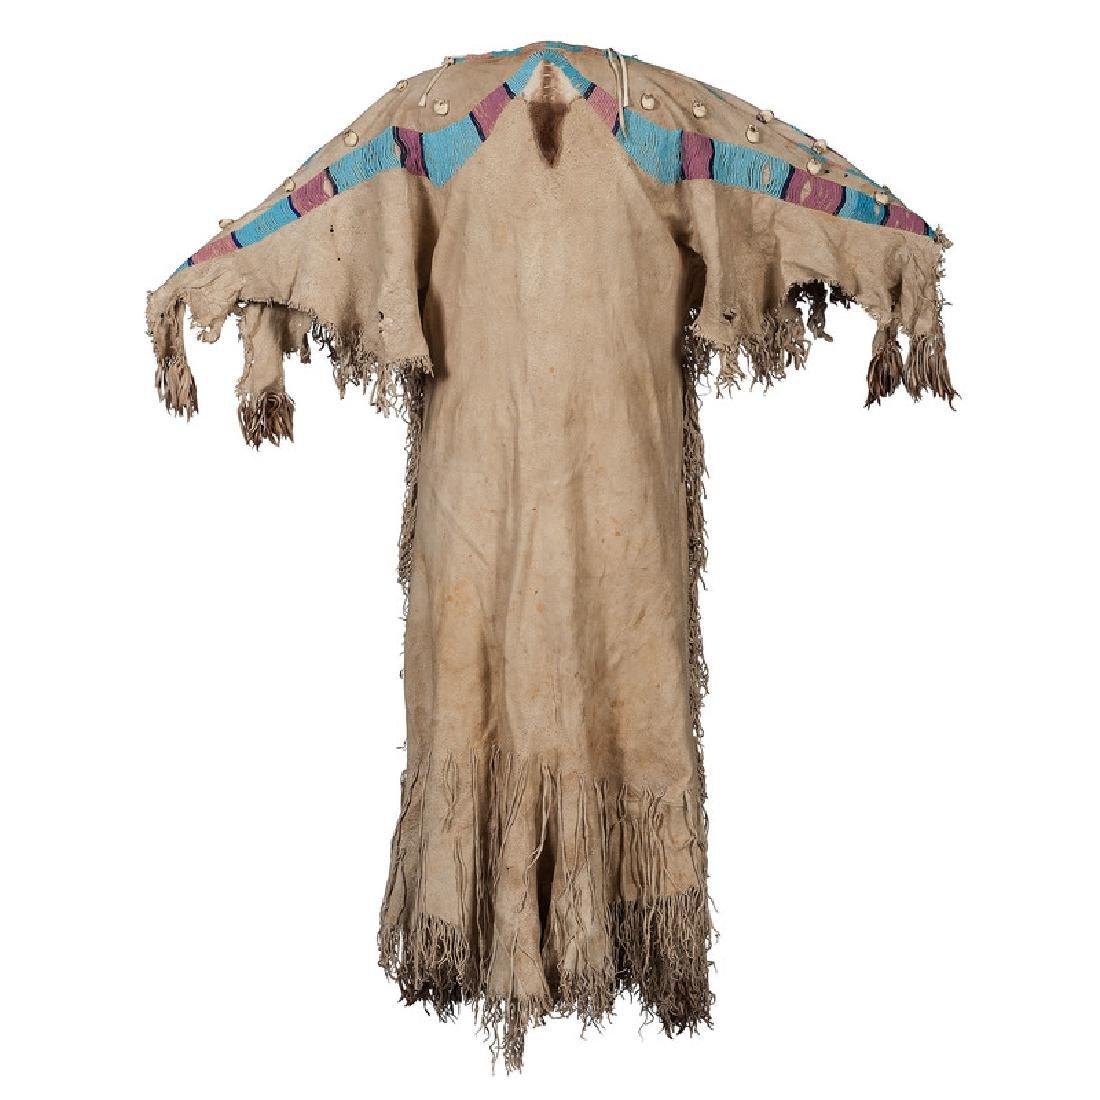 Nez Perce Beaded Hide Dress